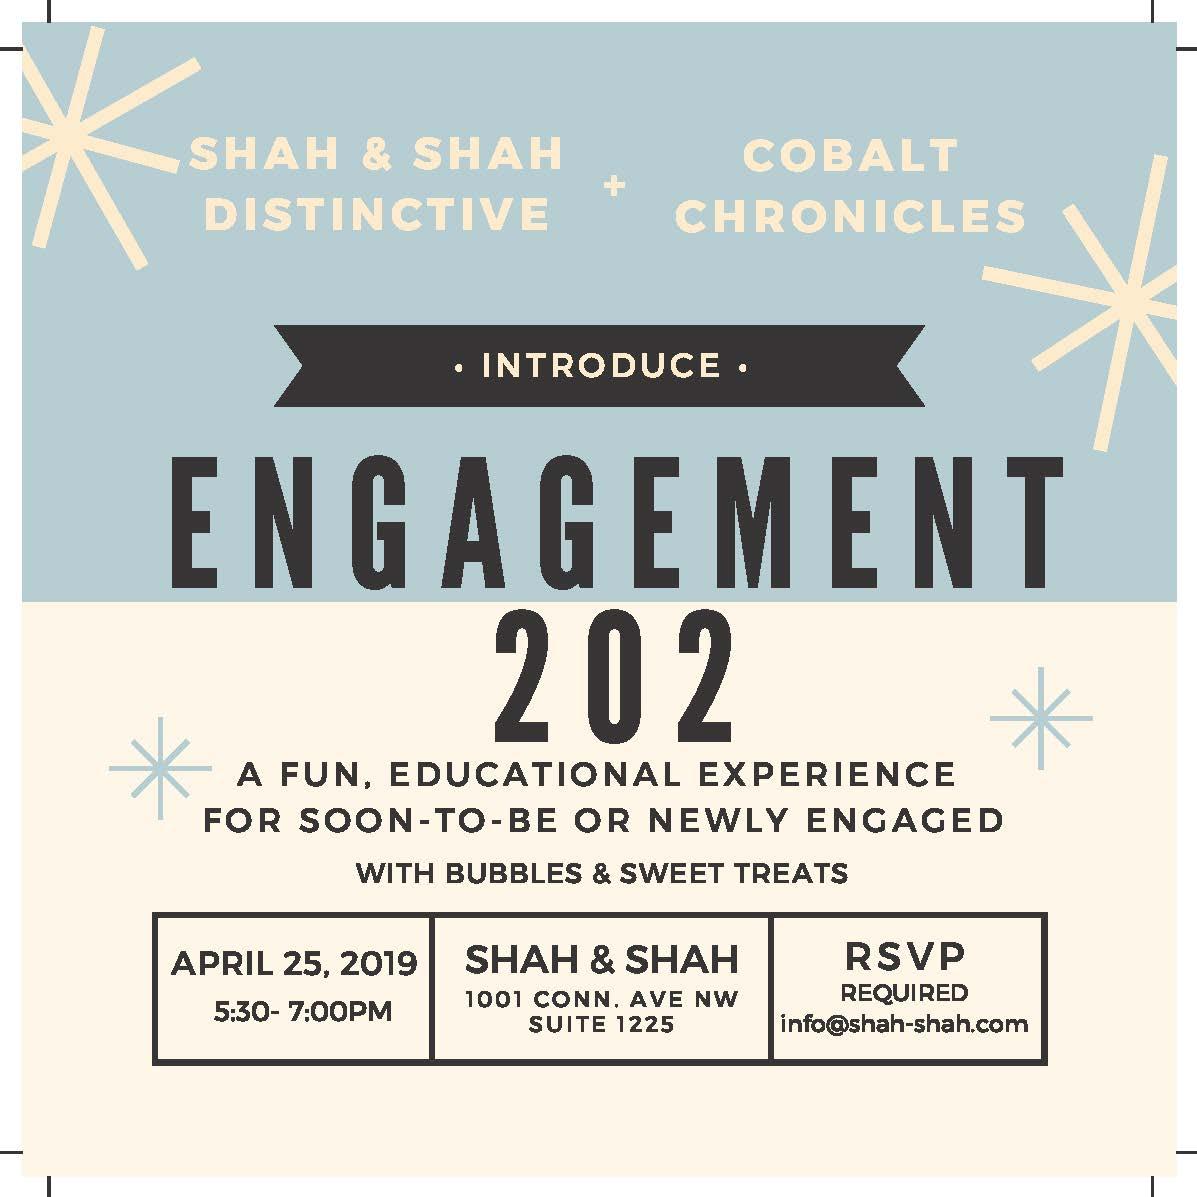 Cobalt Chronicles   Shah & Shah Event